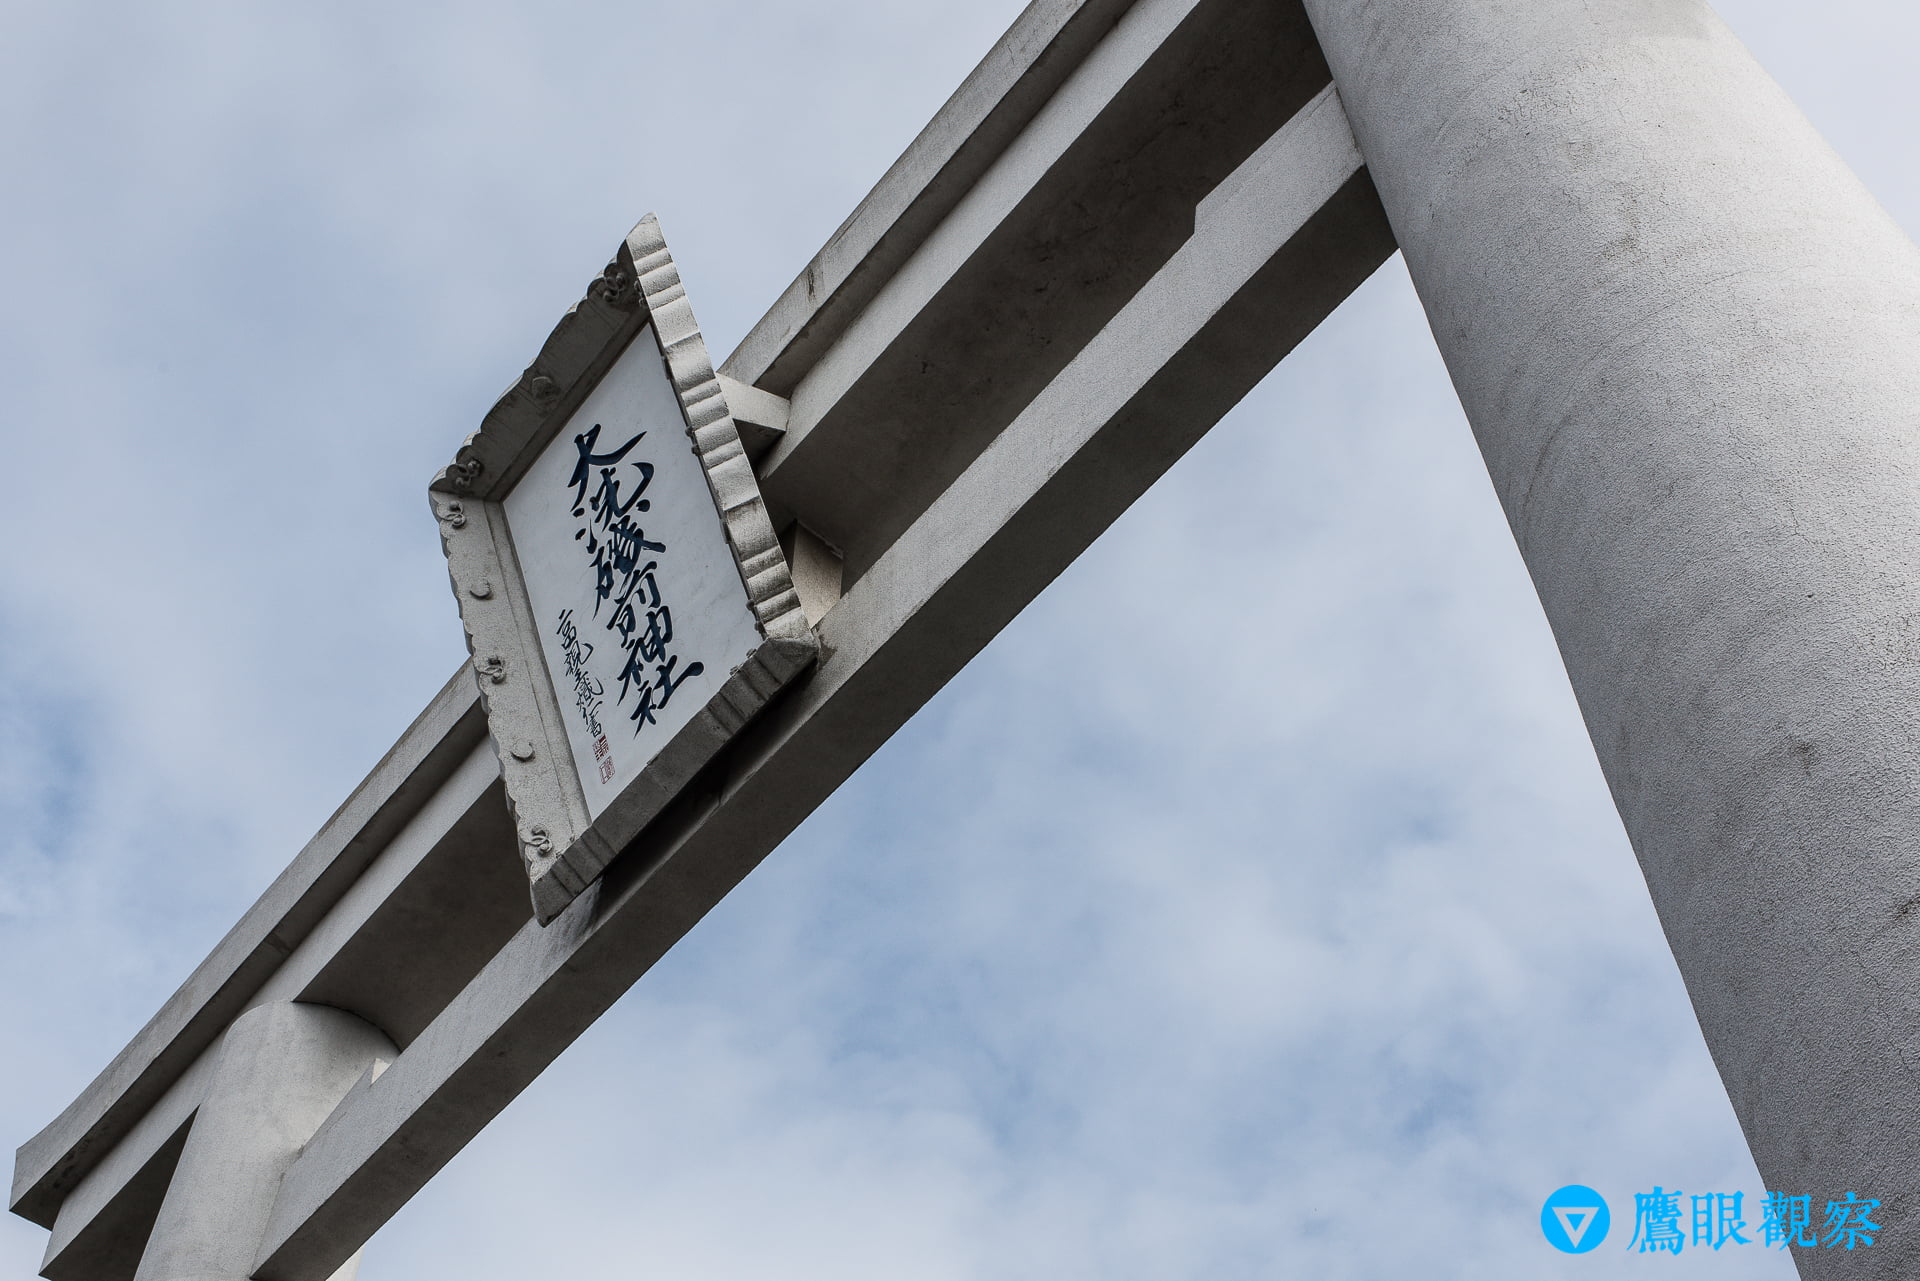 Travel Oarai Hotel in Ibaraki Prefecture Japan 95 日本茨城縣/東茨城/大洗飯店(大洗ホテル)/旅館推薦與住宿旅遊心得分享